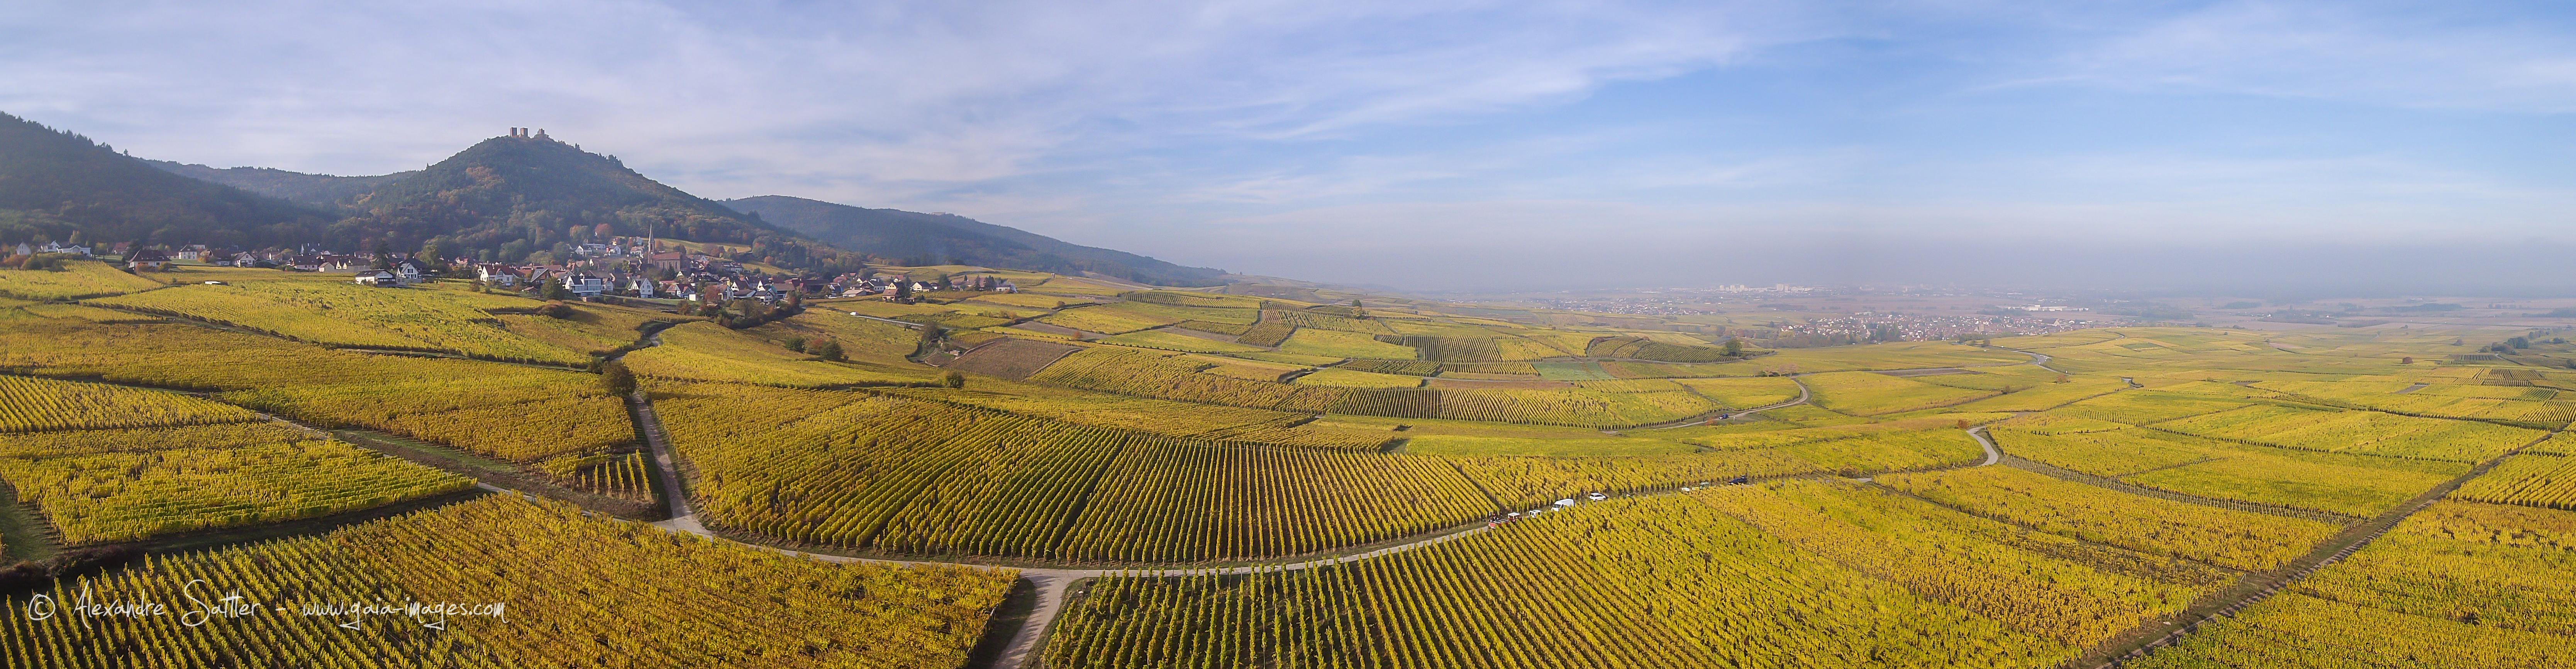 Vignoble Alsacien